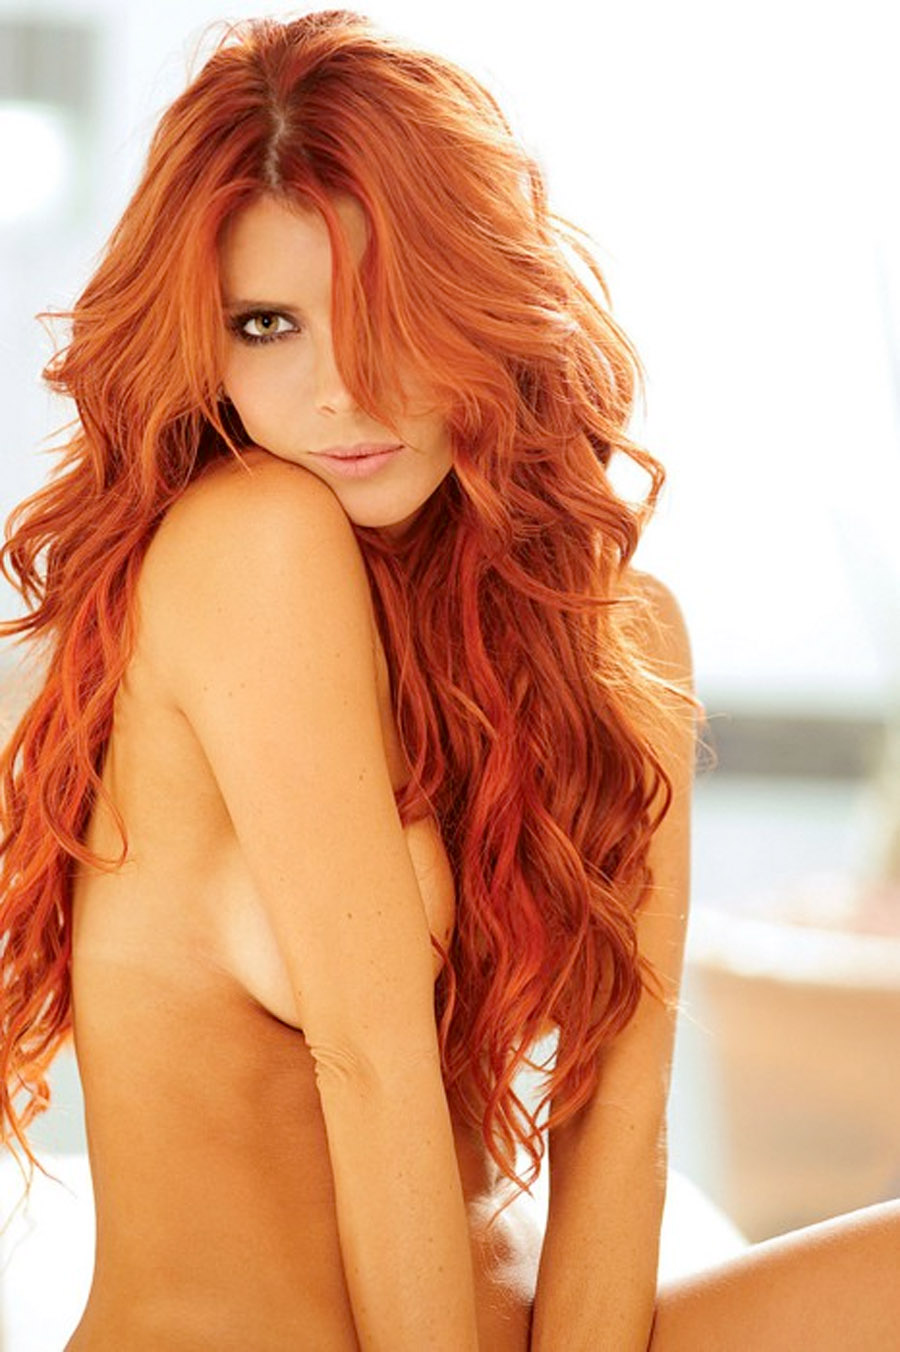 Sexy Red Head Teens 50